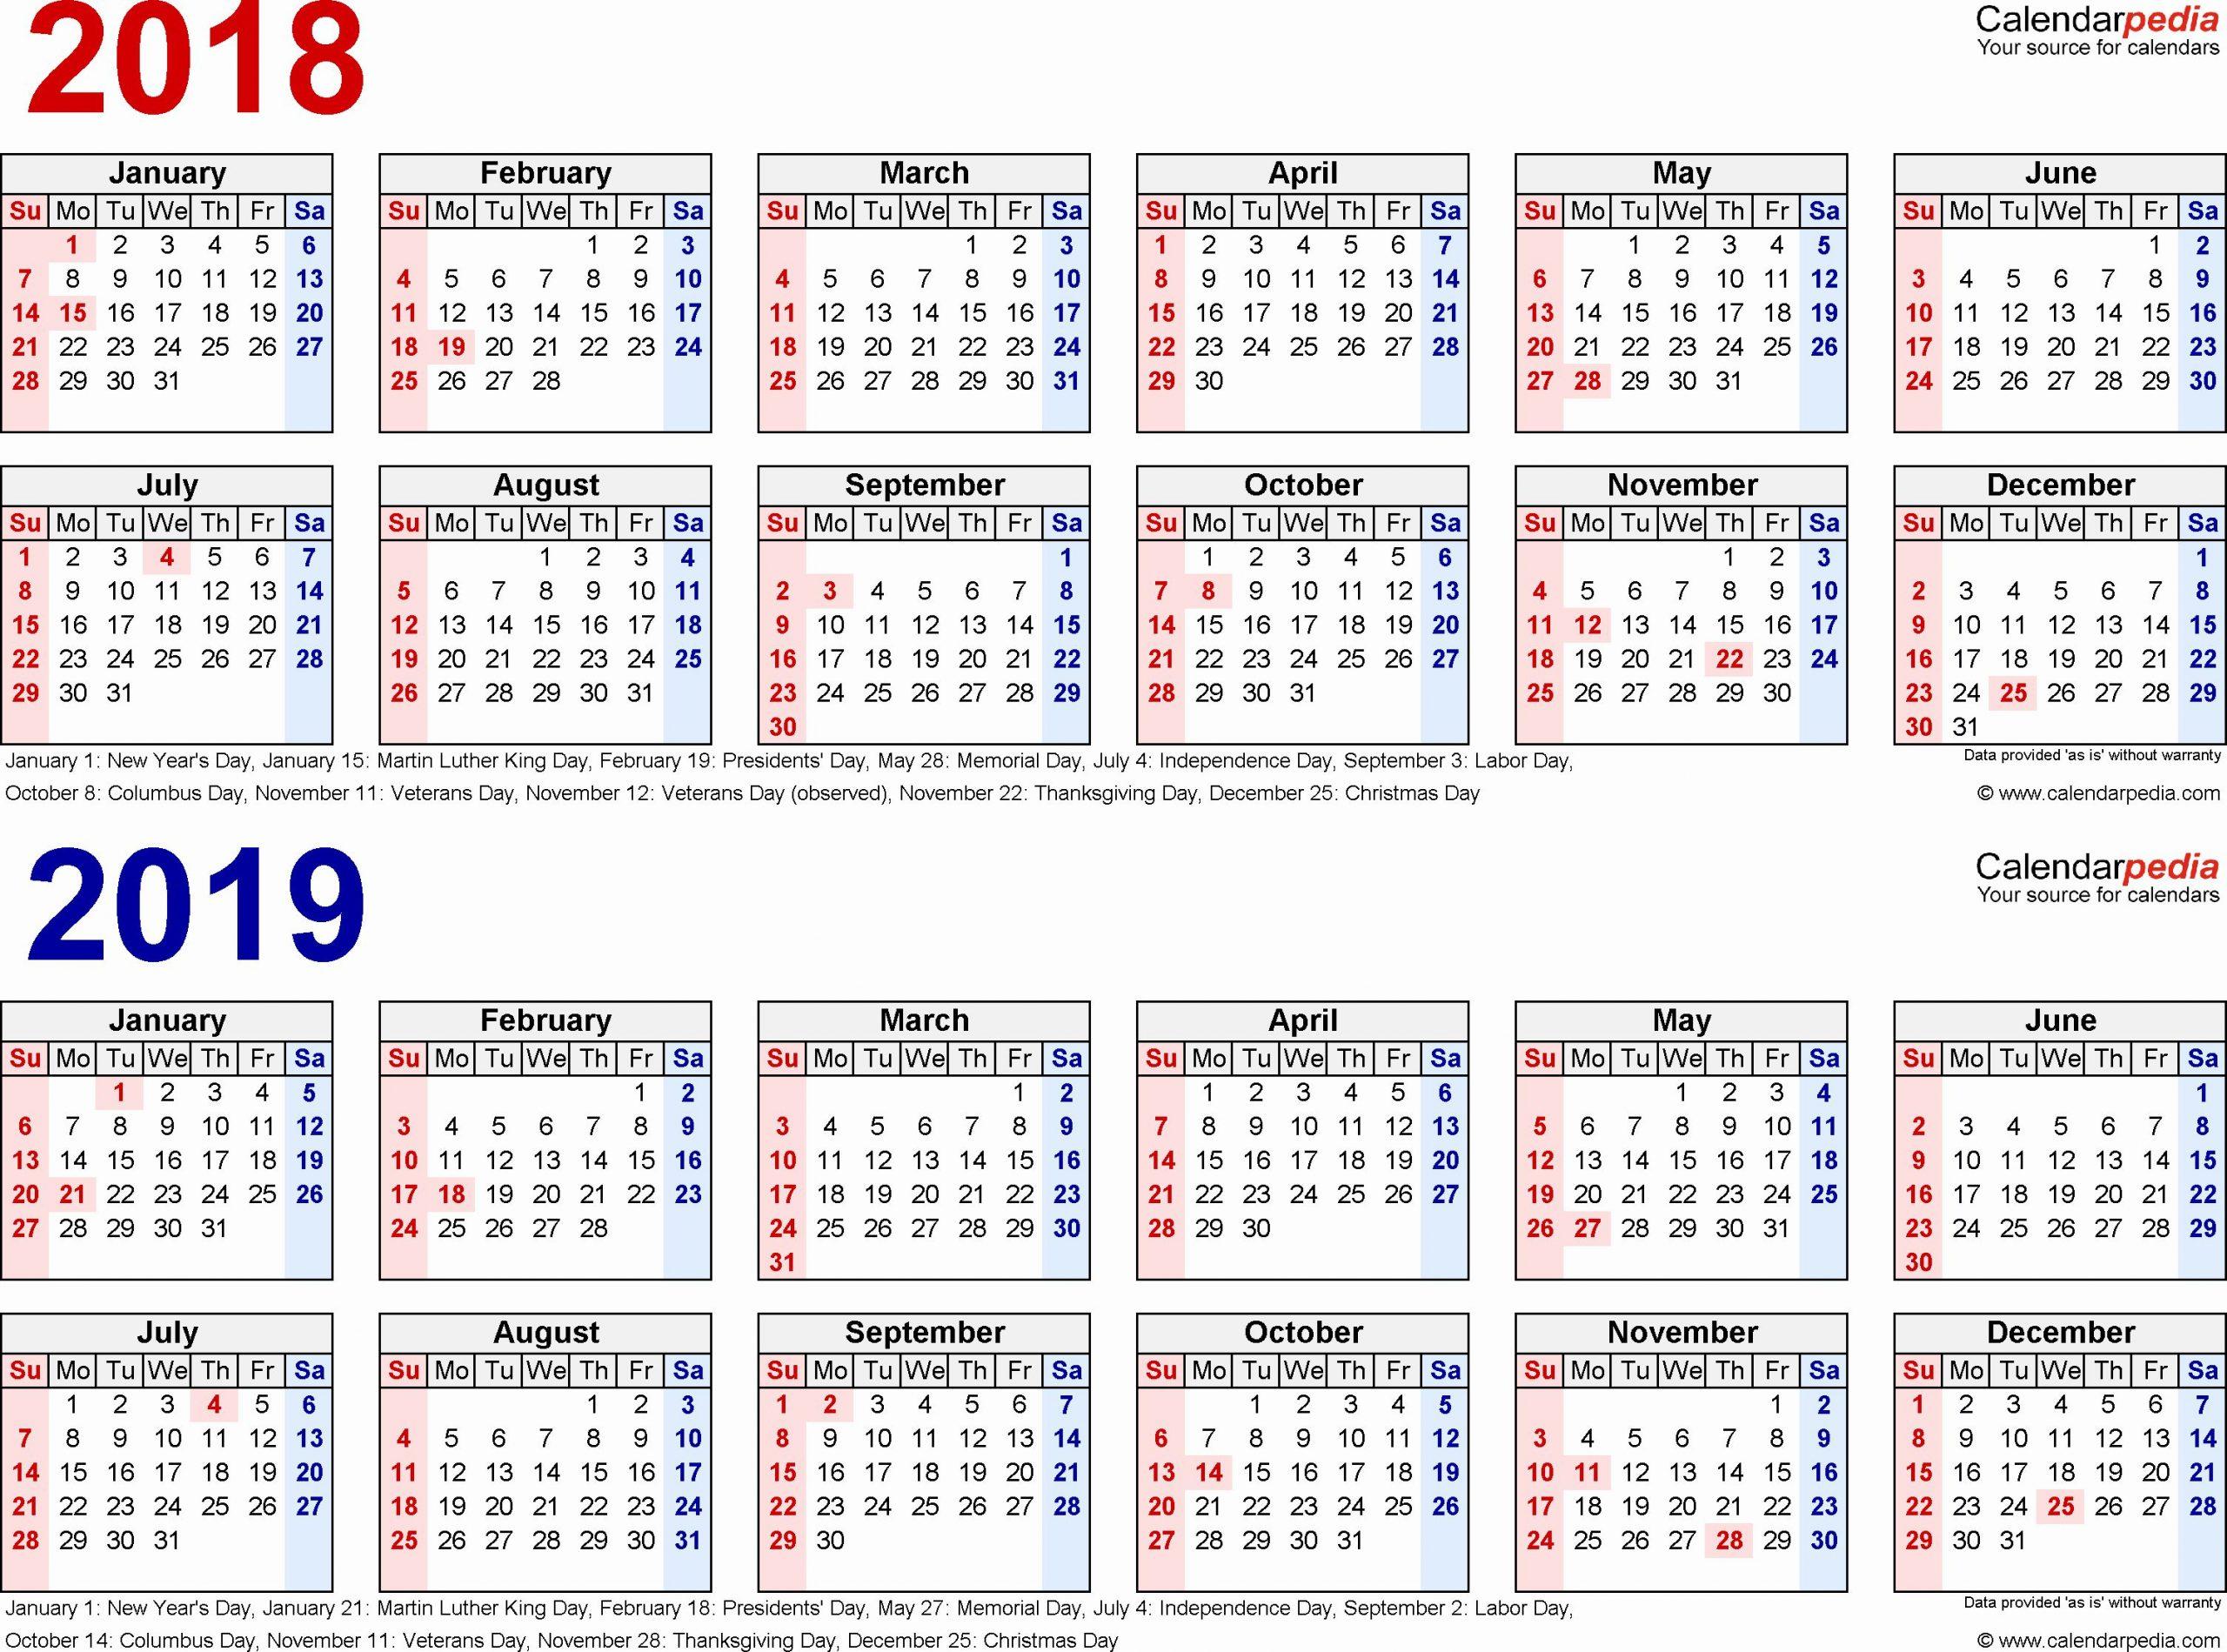 2019 biweekly payroll calendar template excel fresh 2018 1